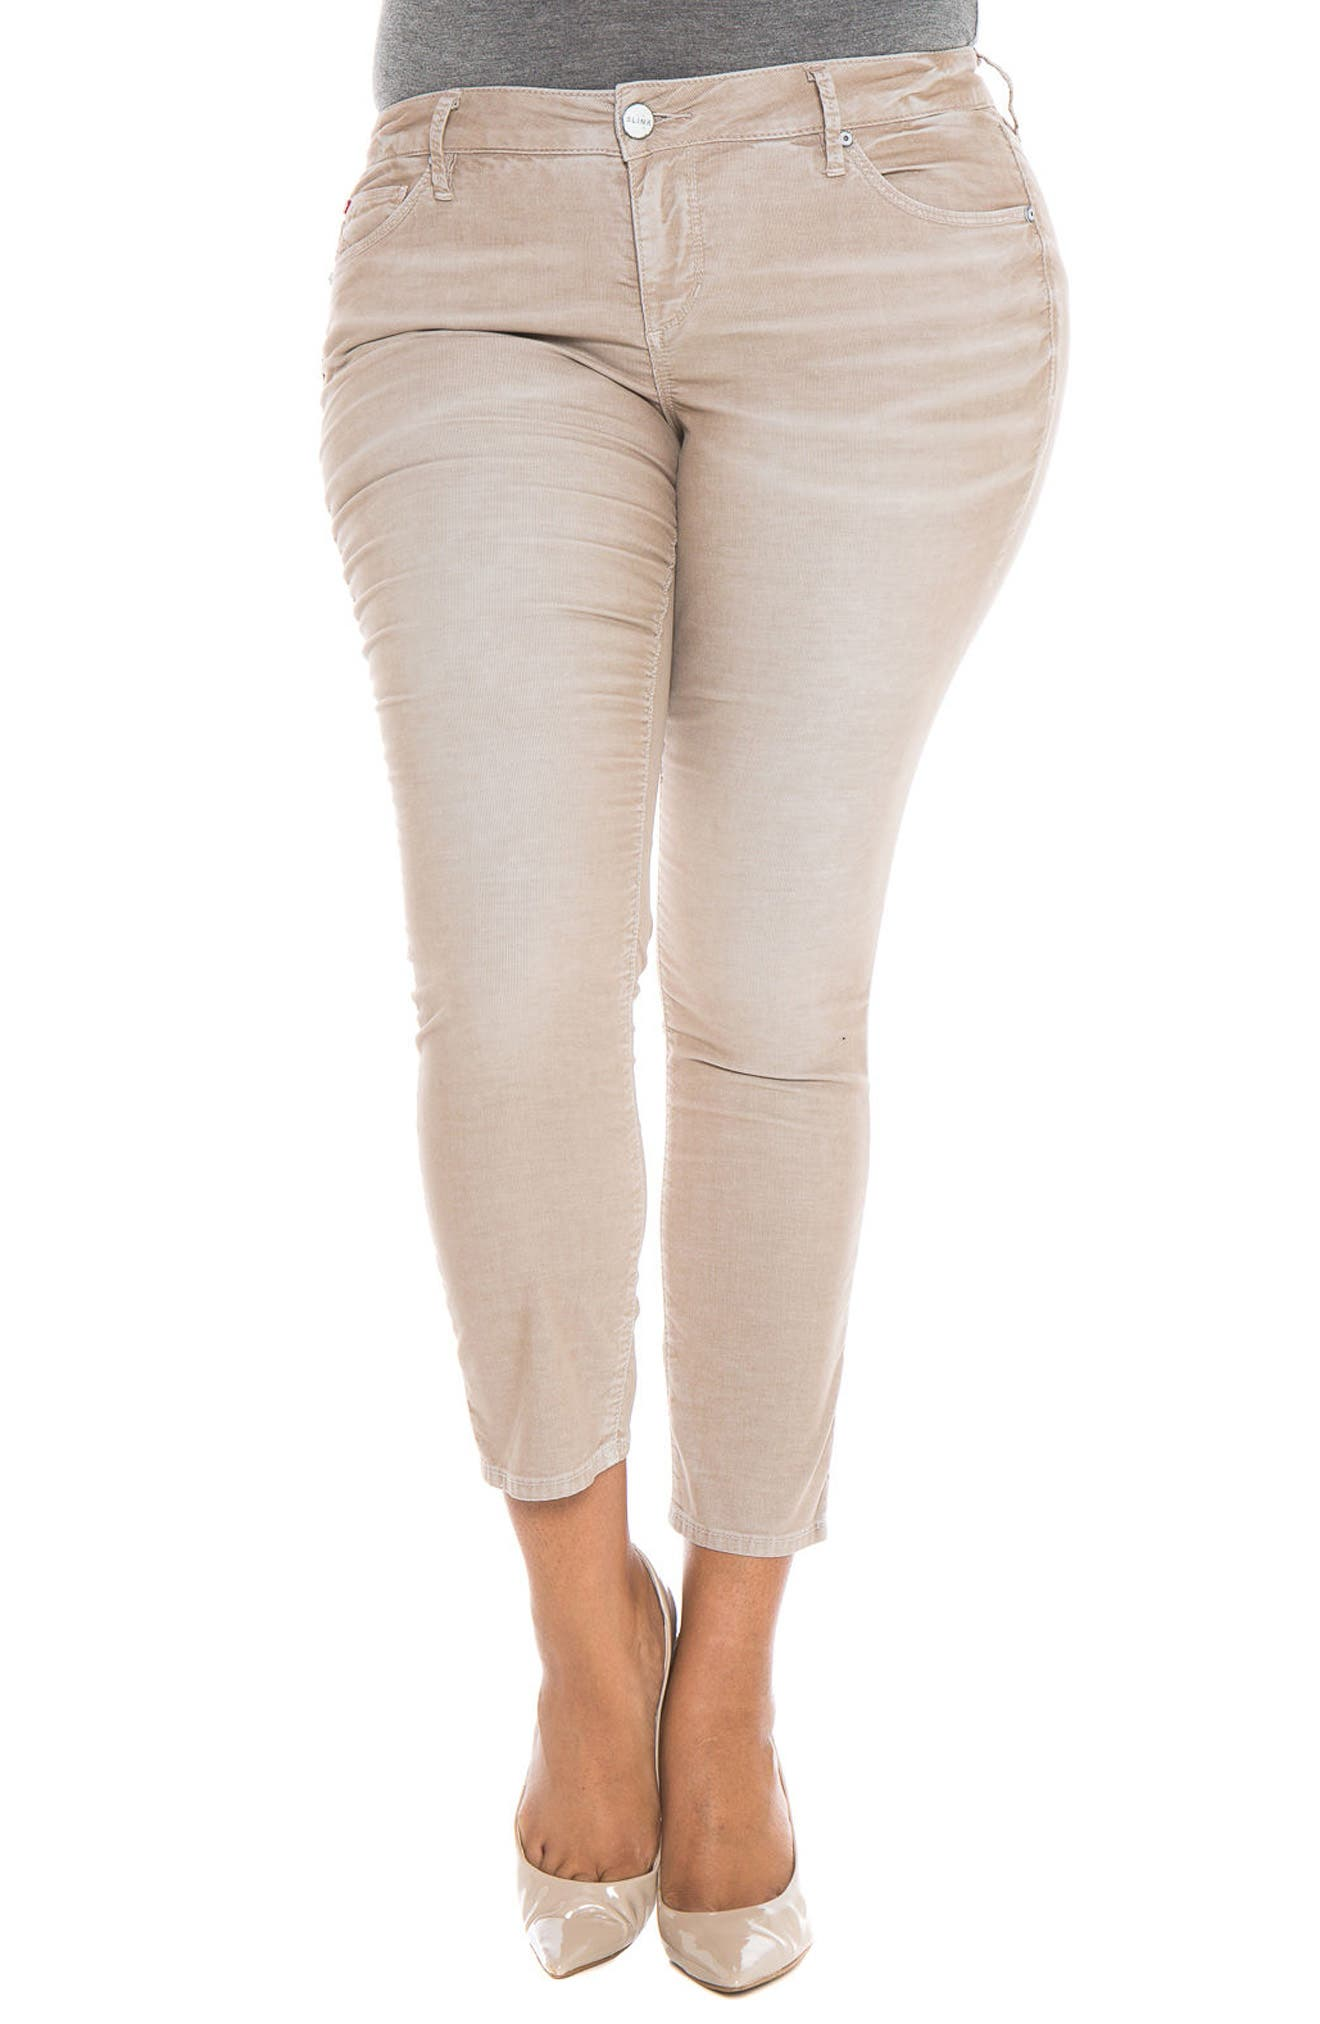 SLINK Jeans Stretch Corduroy Ankle Skinny Pants (Plus Size)